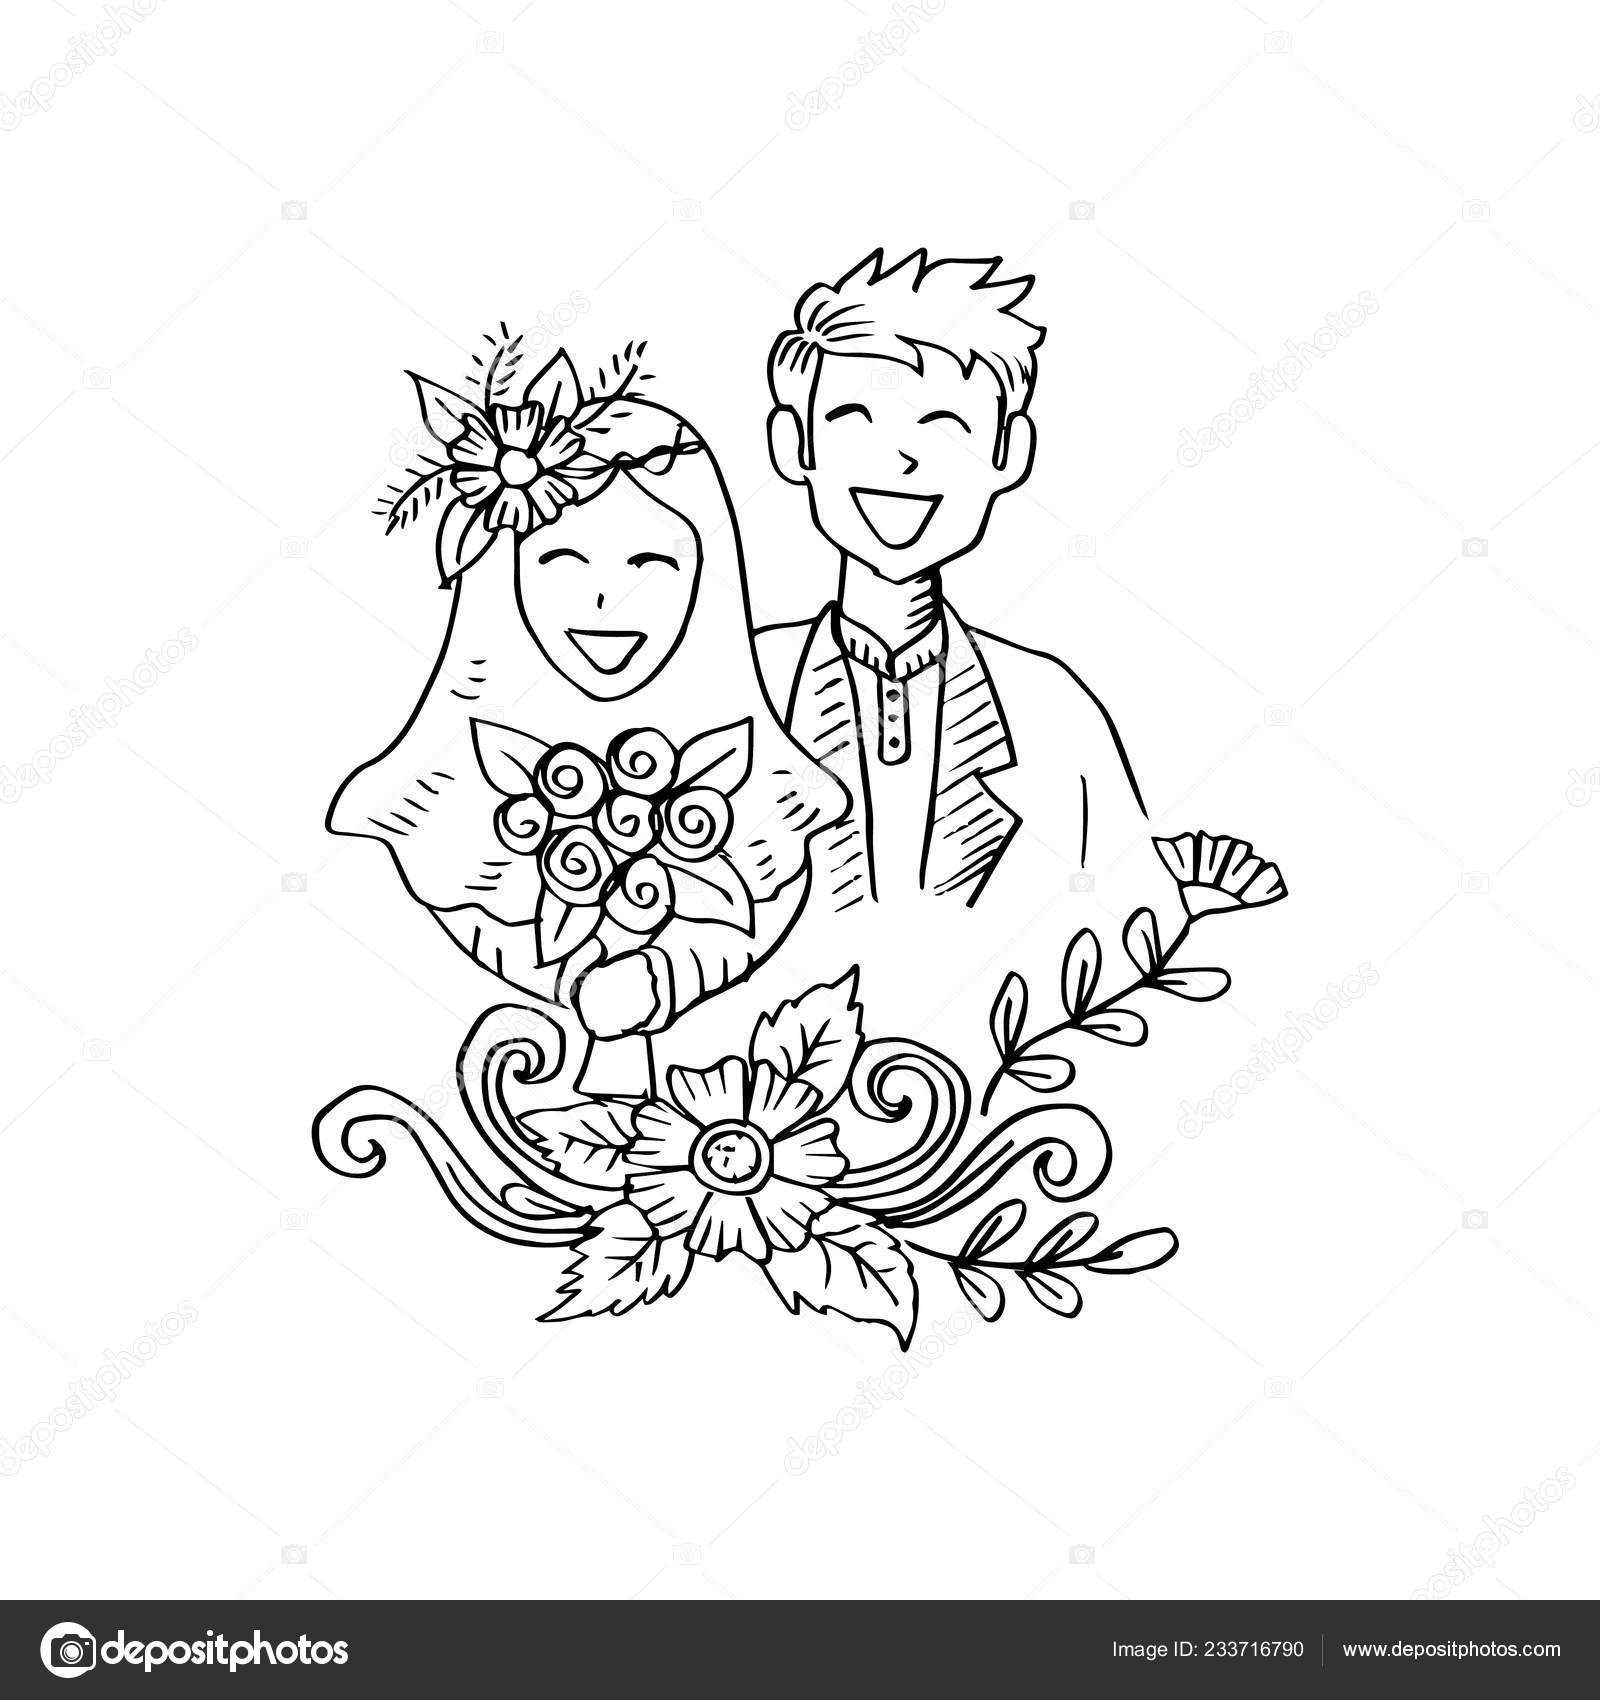 Muslim Couple Wedding Card Stock Vector C Handini 233716790